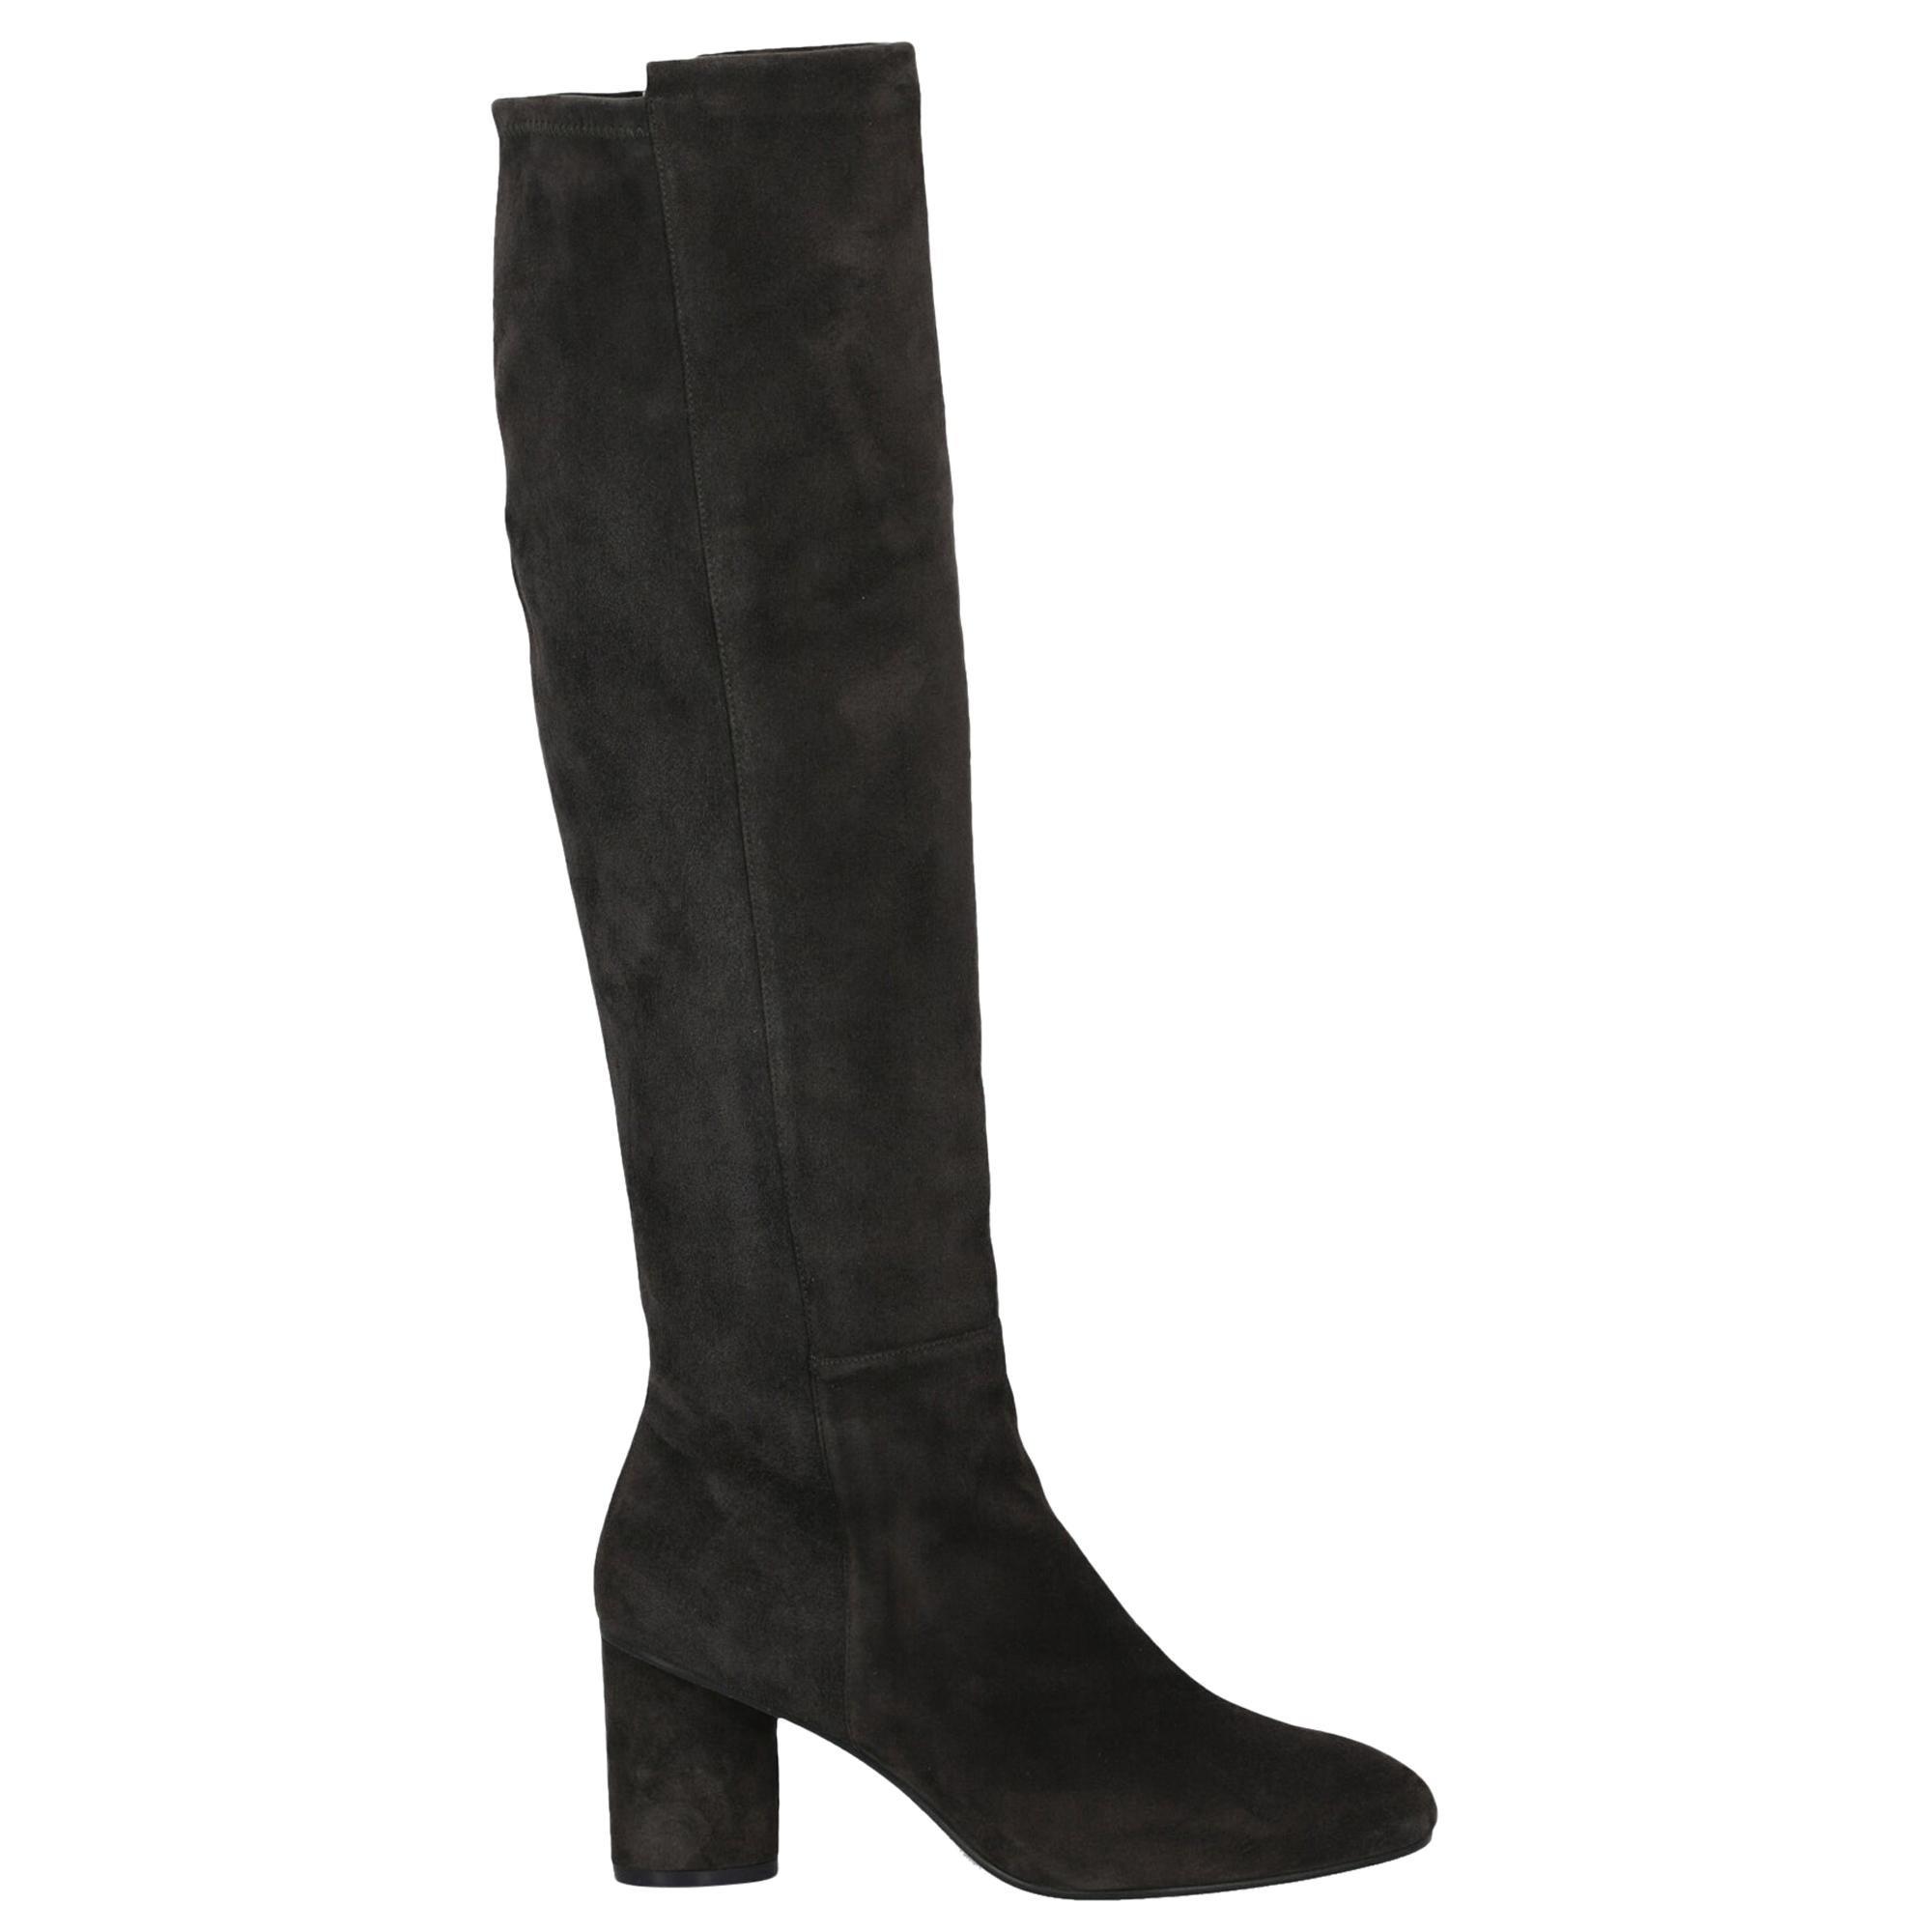 Stuart Weitzman Woman Boots Grey Leather IT 36